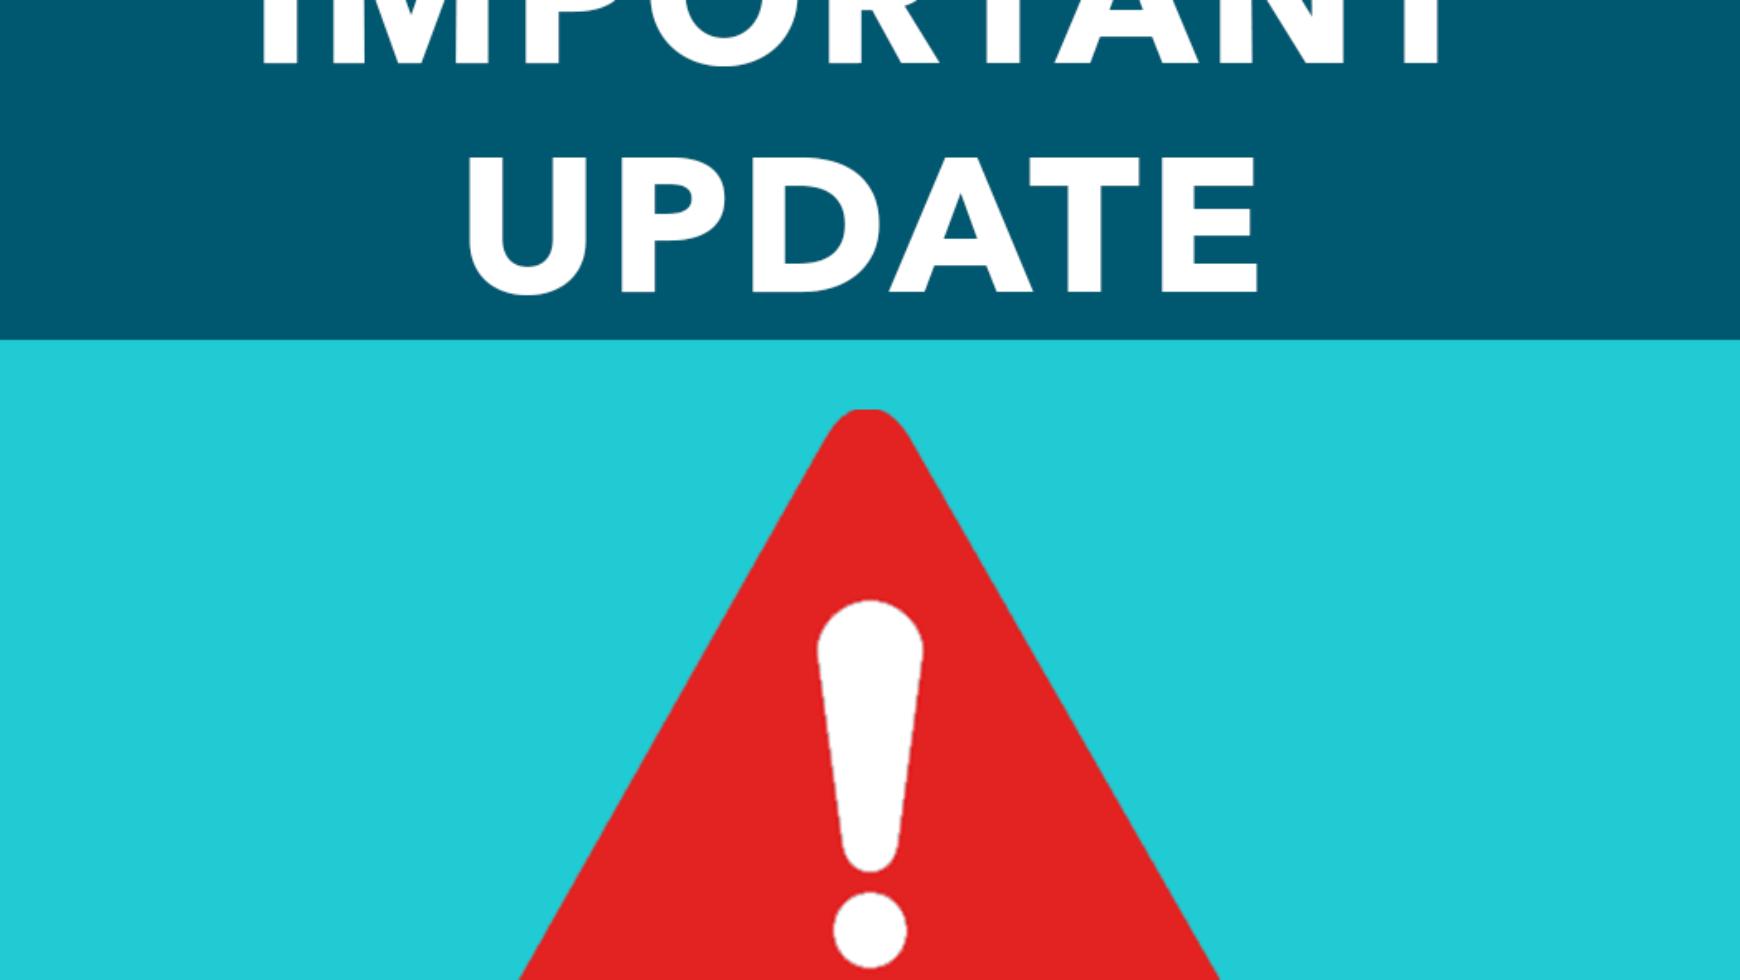 Update: Lockdown Extended